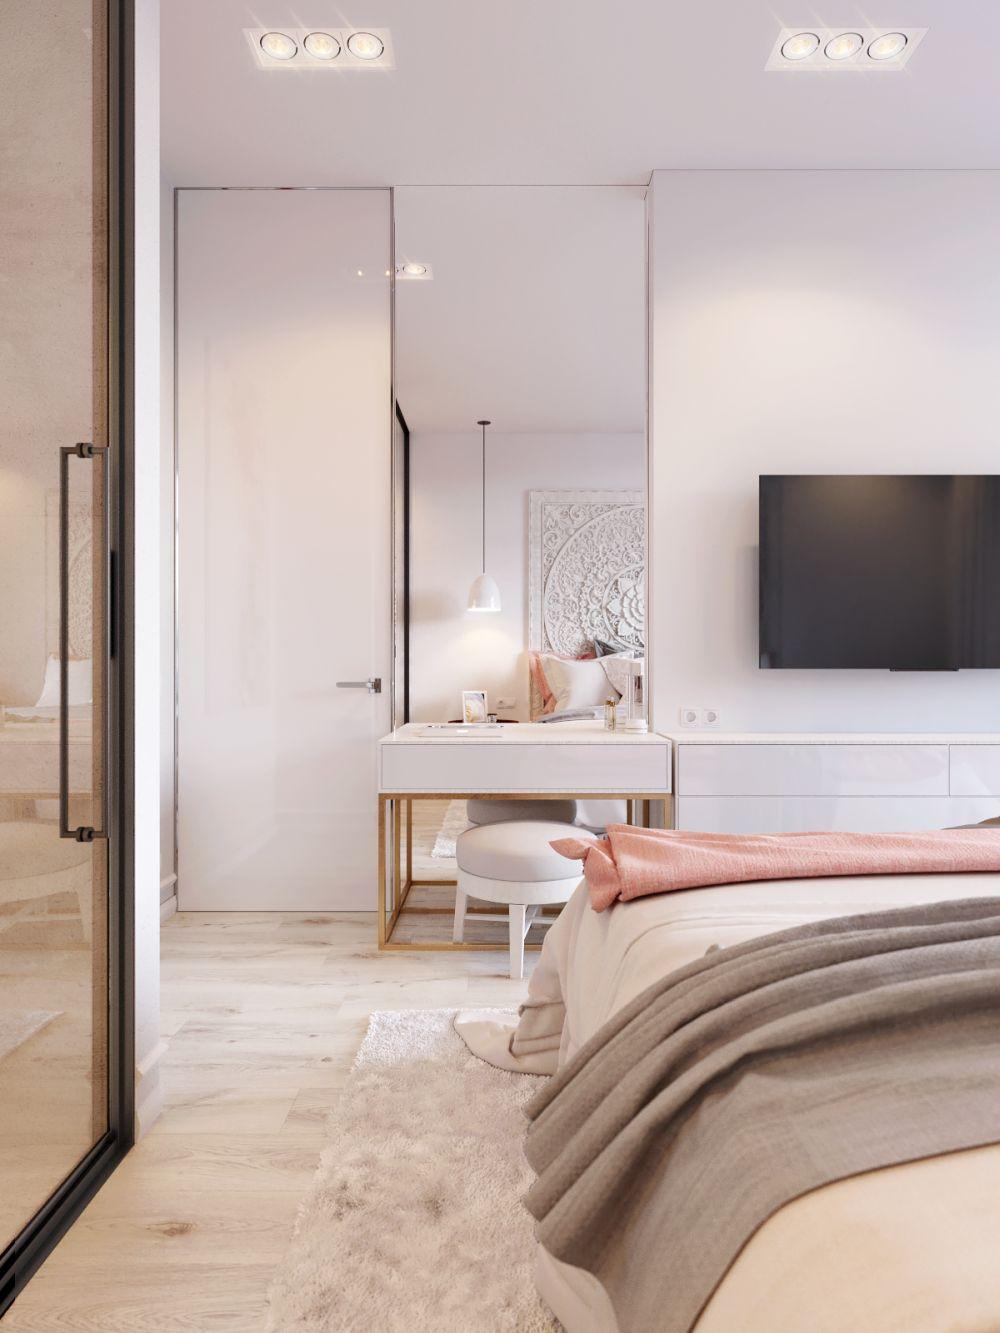 adelaparvu.com despre apartament in nuante delicate, designer Dima Kravtsov (1)